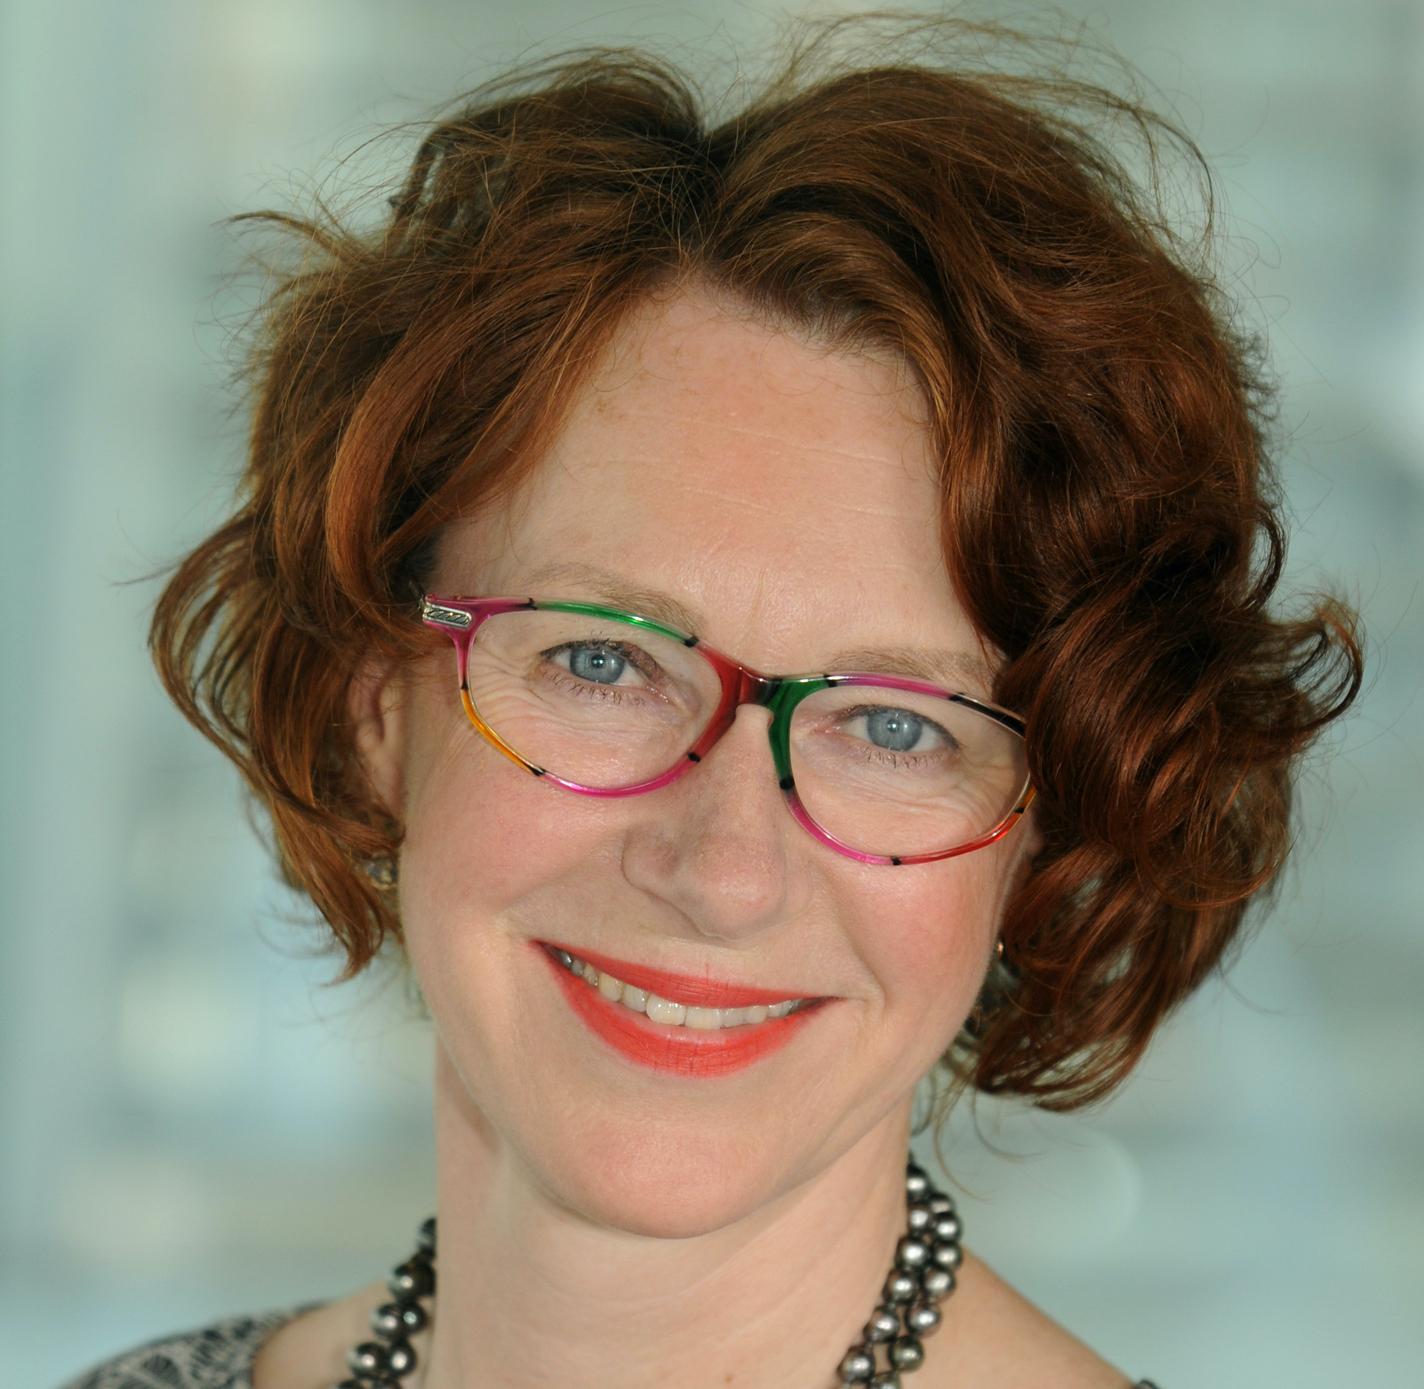 Univ.-Prof. Dr. Ulrike Guérot